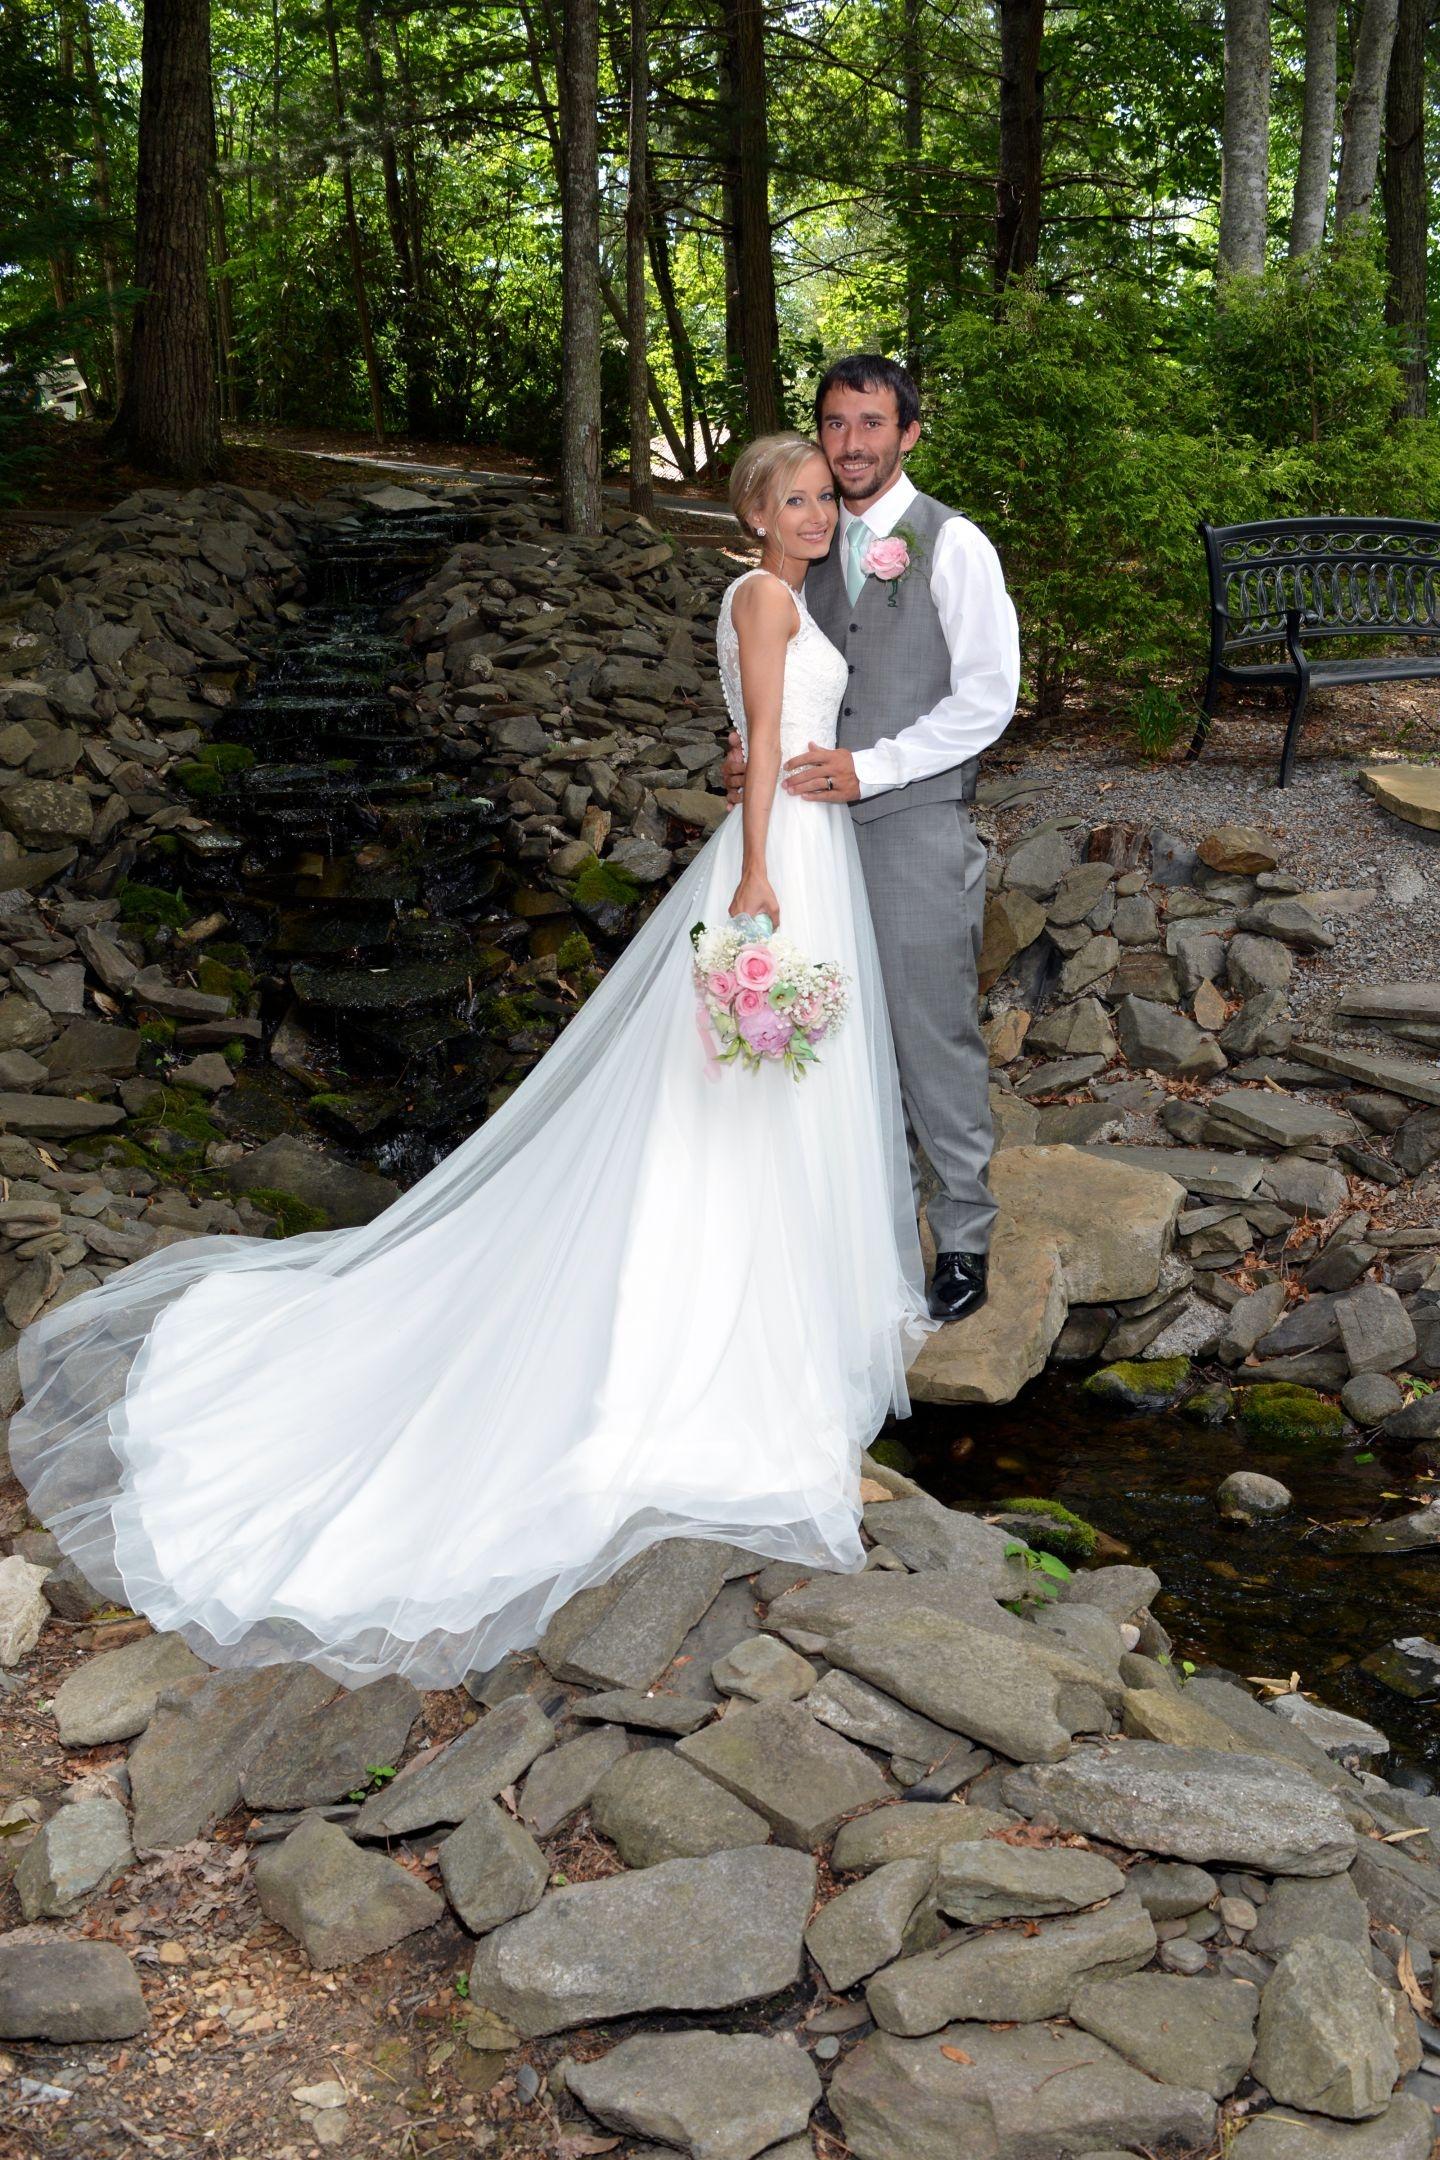 Wedding Chapel at Honeymoon Hills, Gatlinburg Wedding Chapel image 11